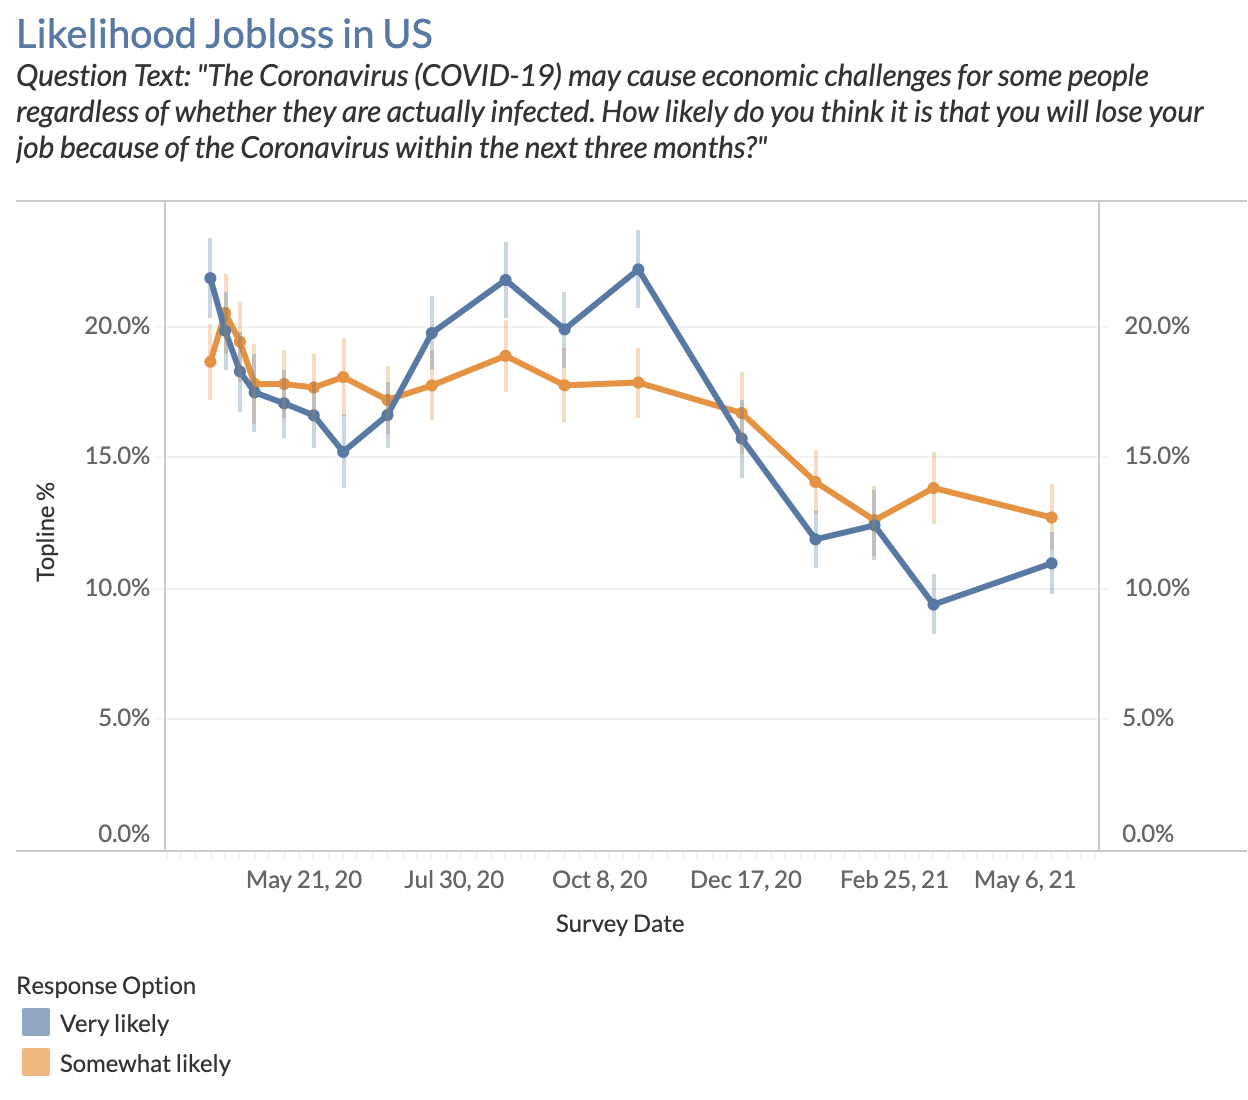 Likelihood Jobloss in US